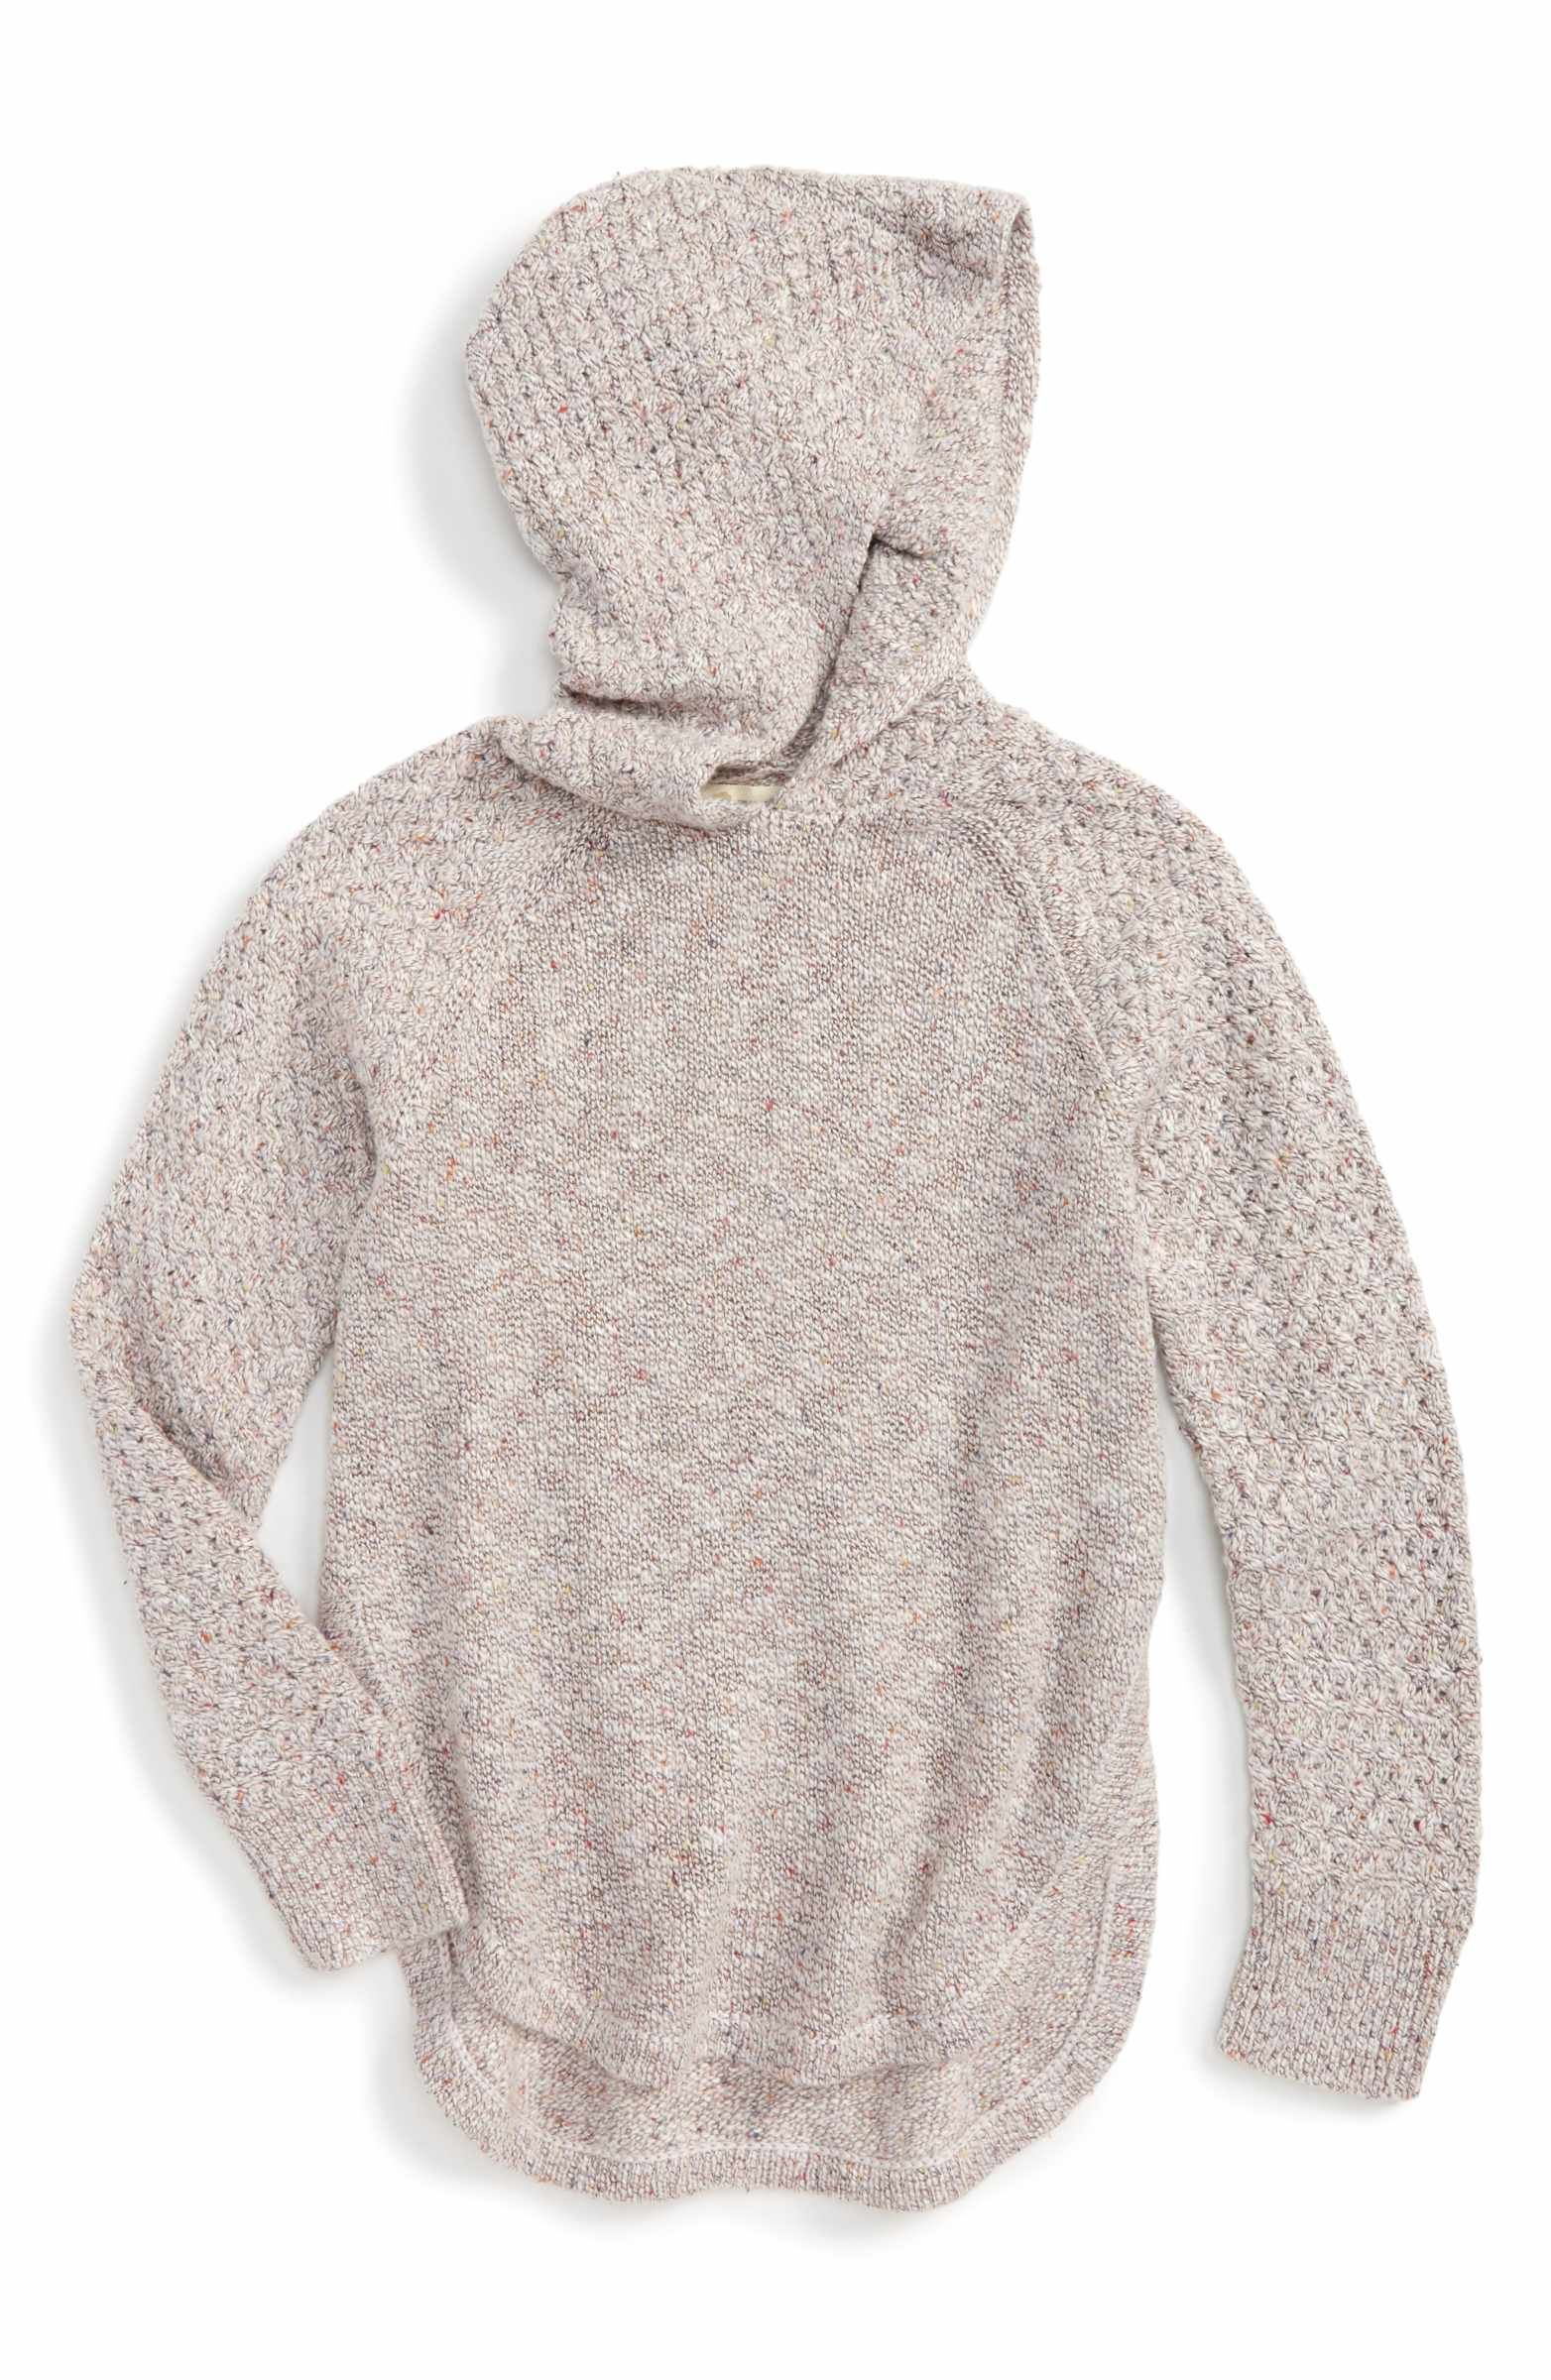 0577e73ea Main Image - Tucker + Tate Hooded Sweater (Toddler Girls